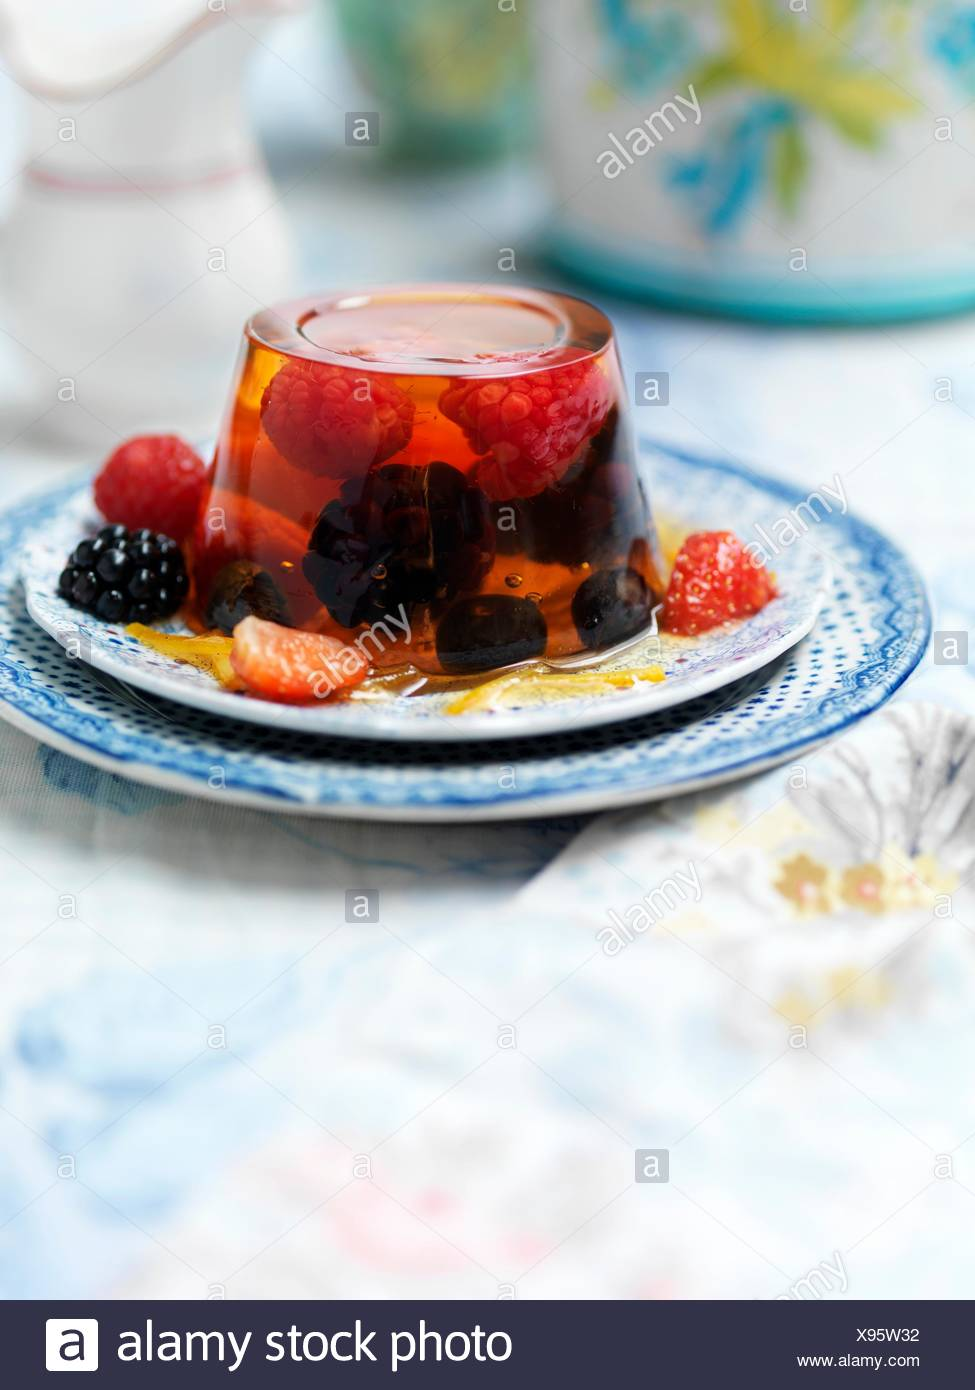 Jelly, strawberries, blackberries - Stock Image